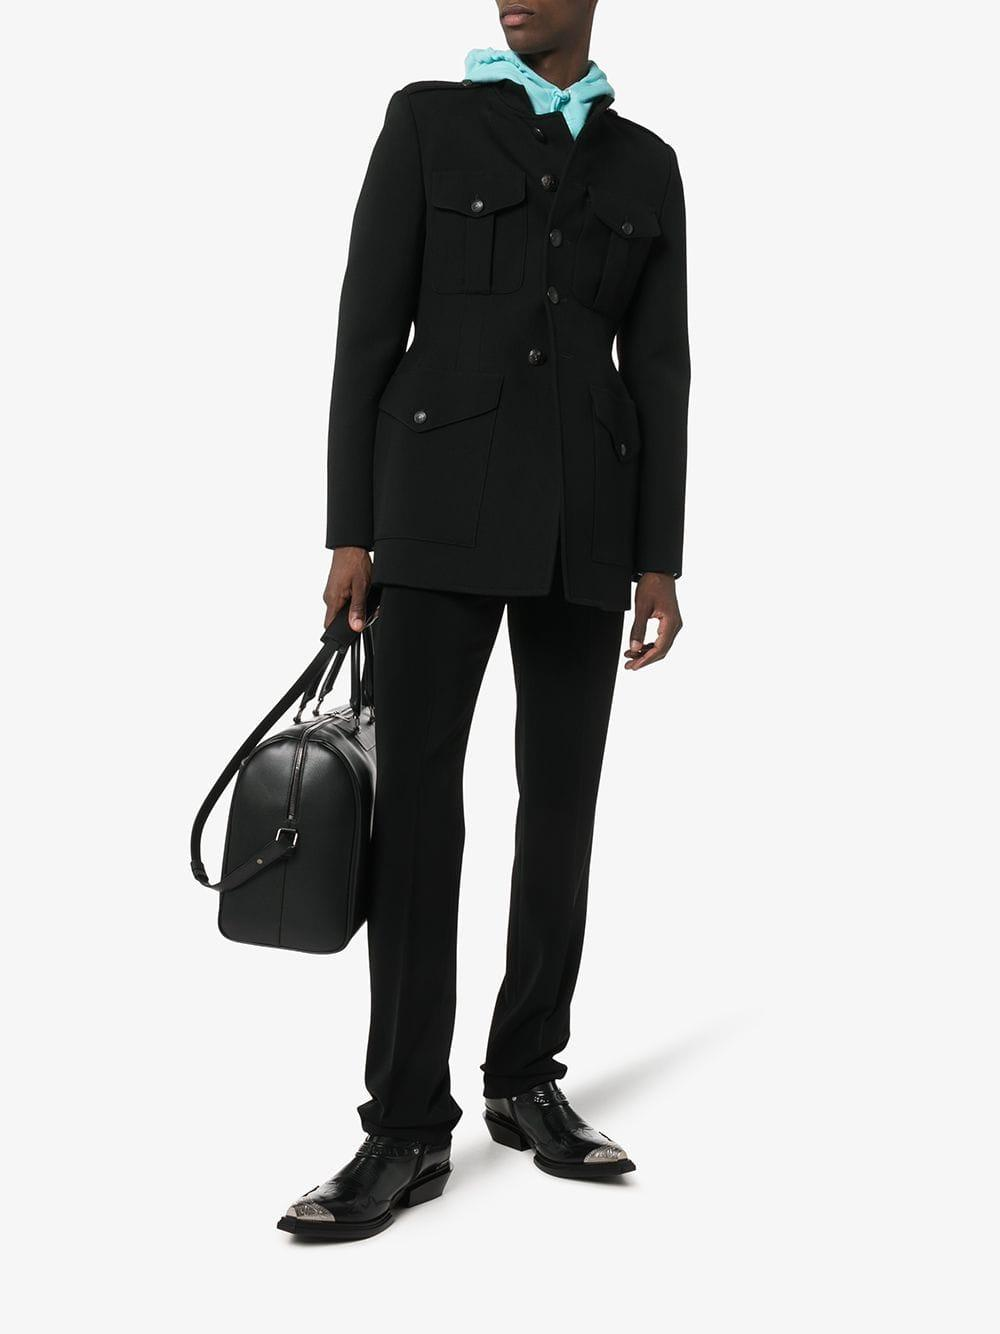 2361e4fa30678 Lyst - Balenciaga Black Santiago Steel Capped Leather Boots in Black for Men